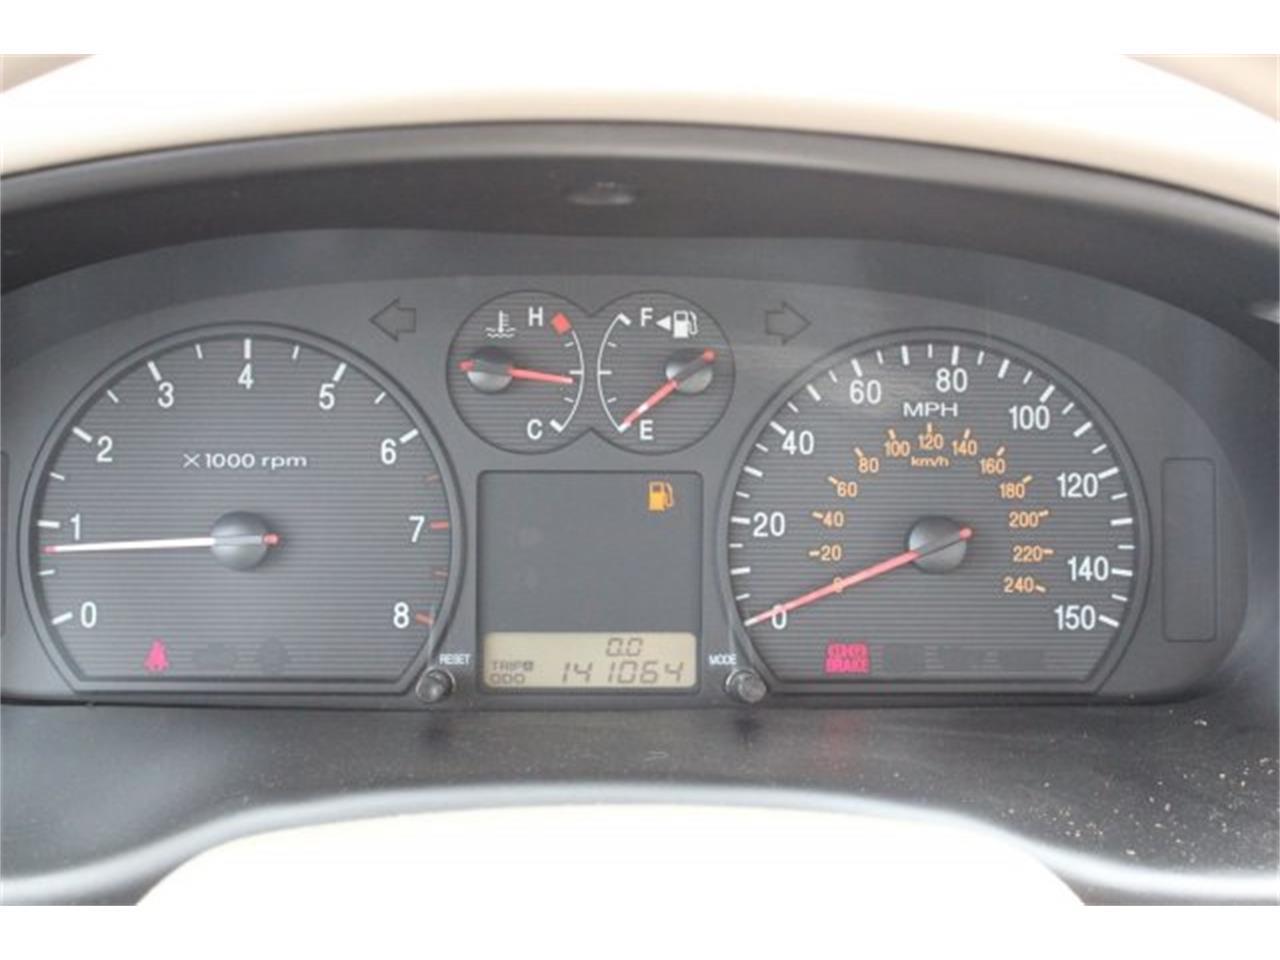 Large Picture of '05 Hyundai Sonata located in Washington - $4,995.00 - JJGU